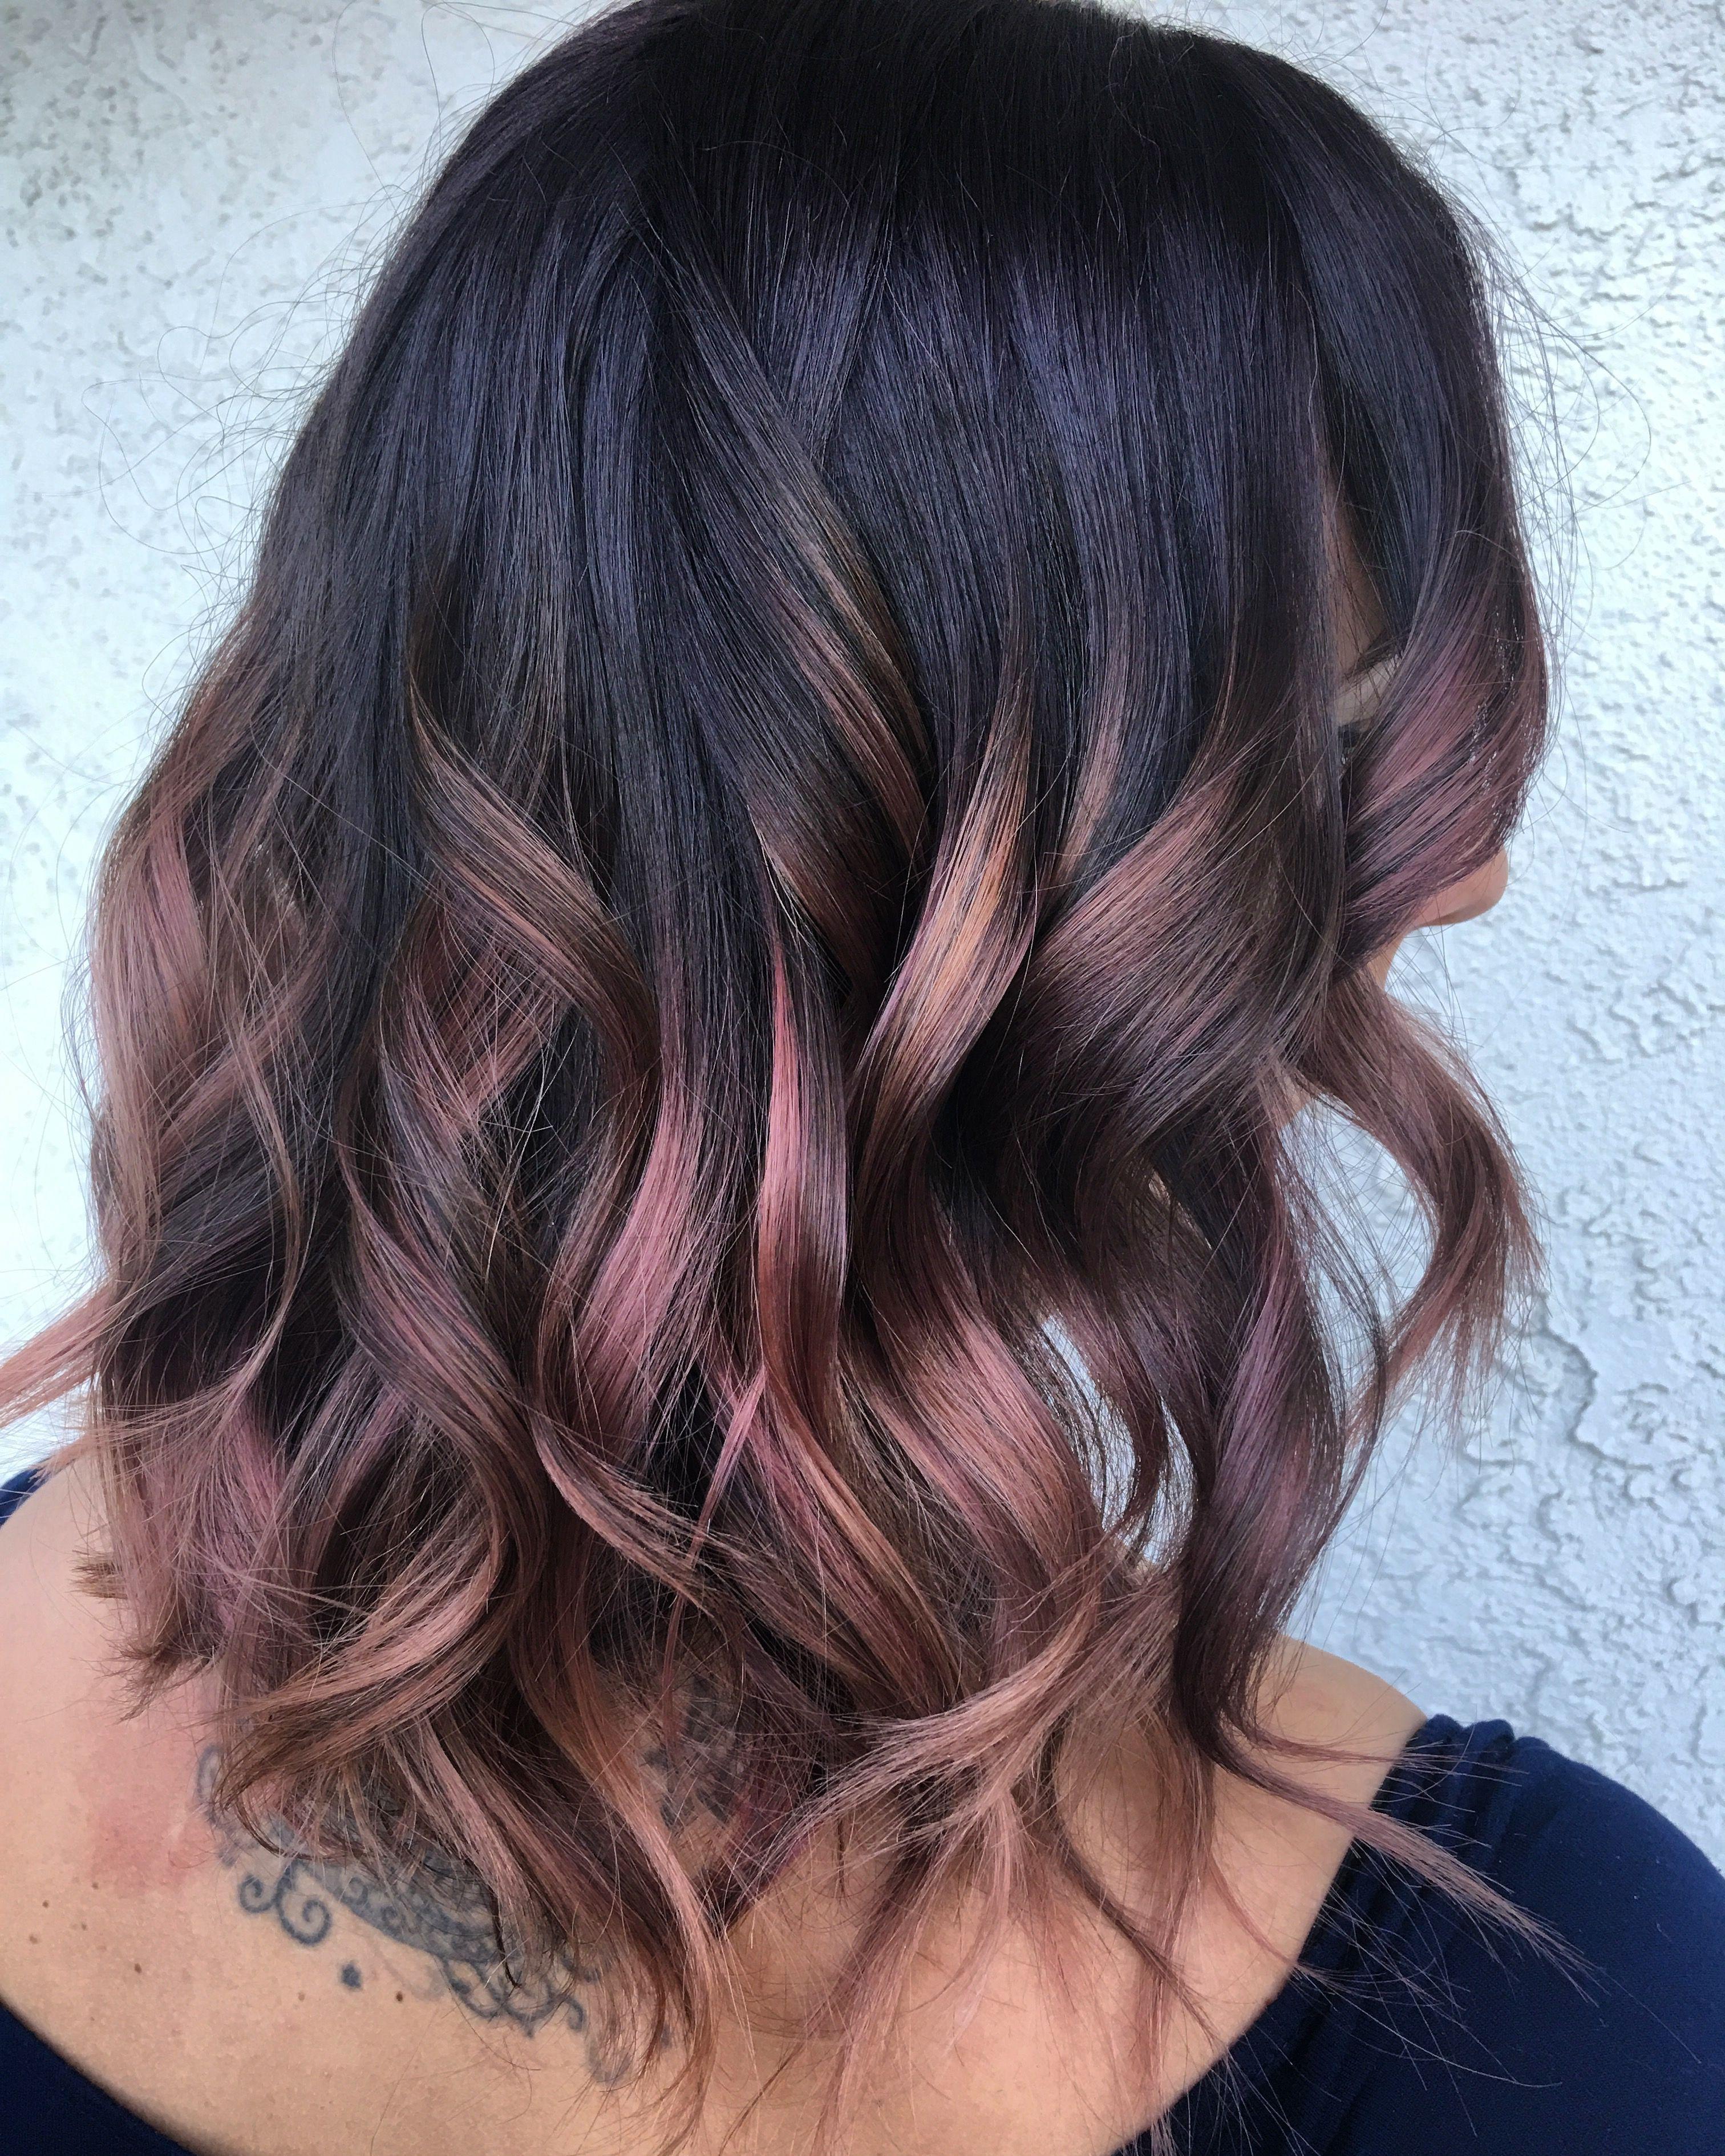 Burgundy Rose Gold Balayage Ombre Hair Hair Color Rose Gold Hair Color For Black Hair Burgundy Hair